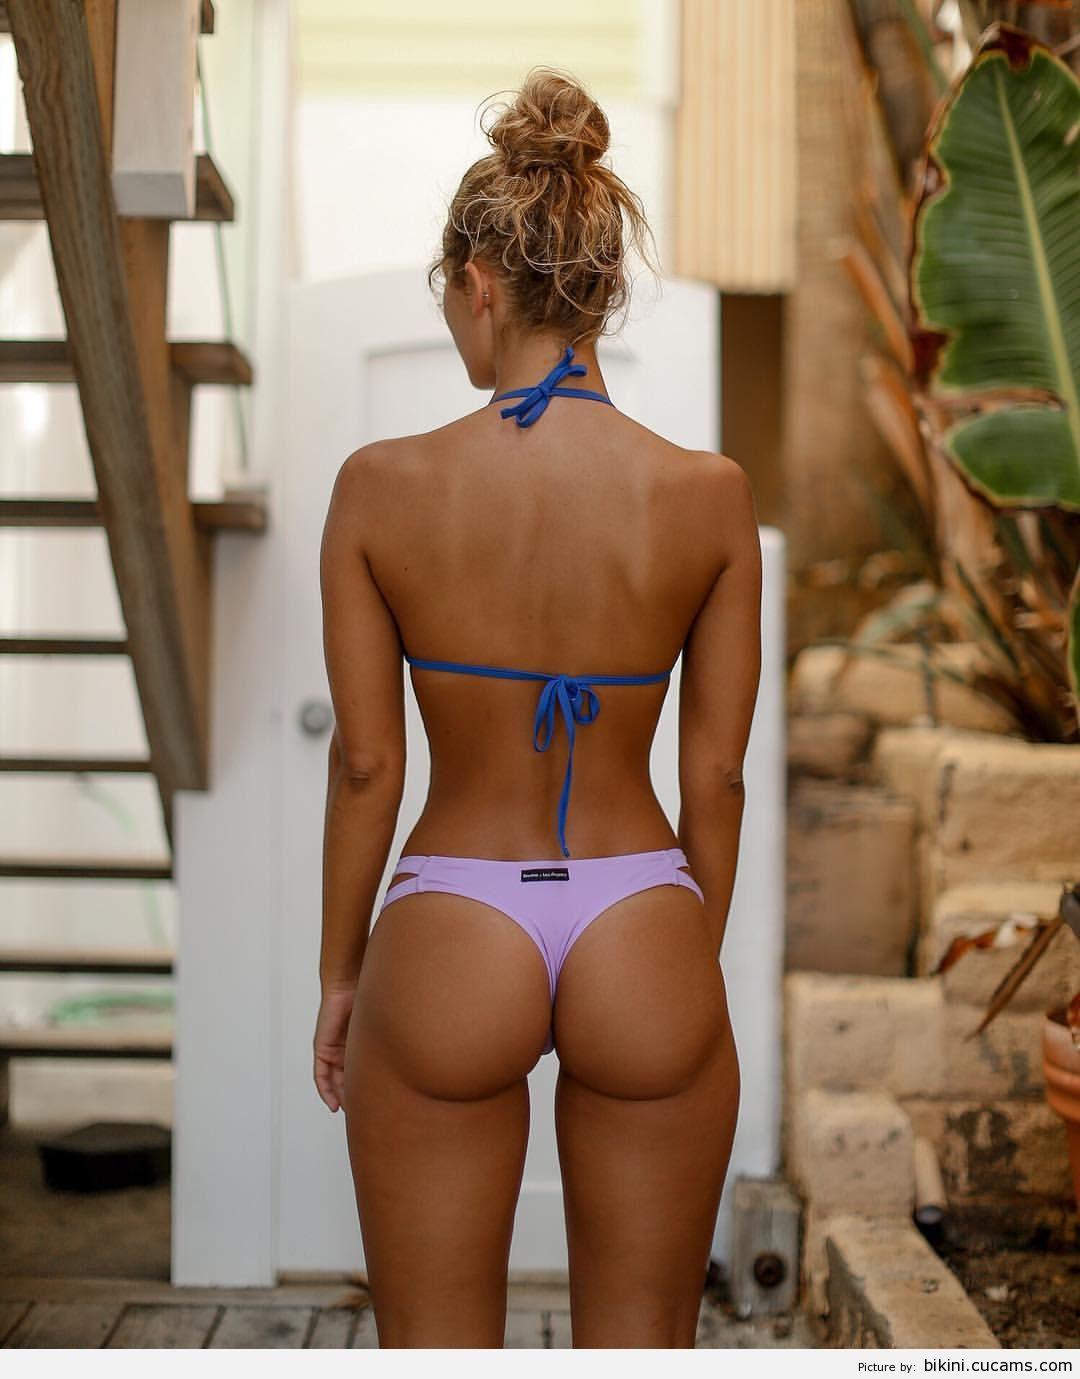 Bikini Vid Penetration by bikini.cucams.com